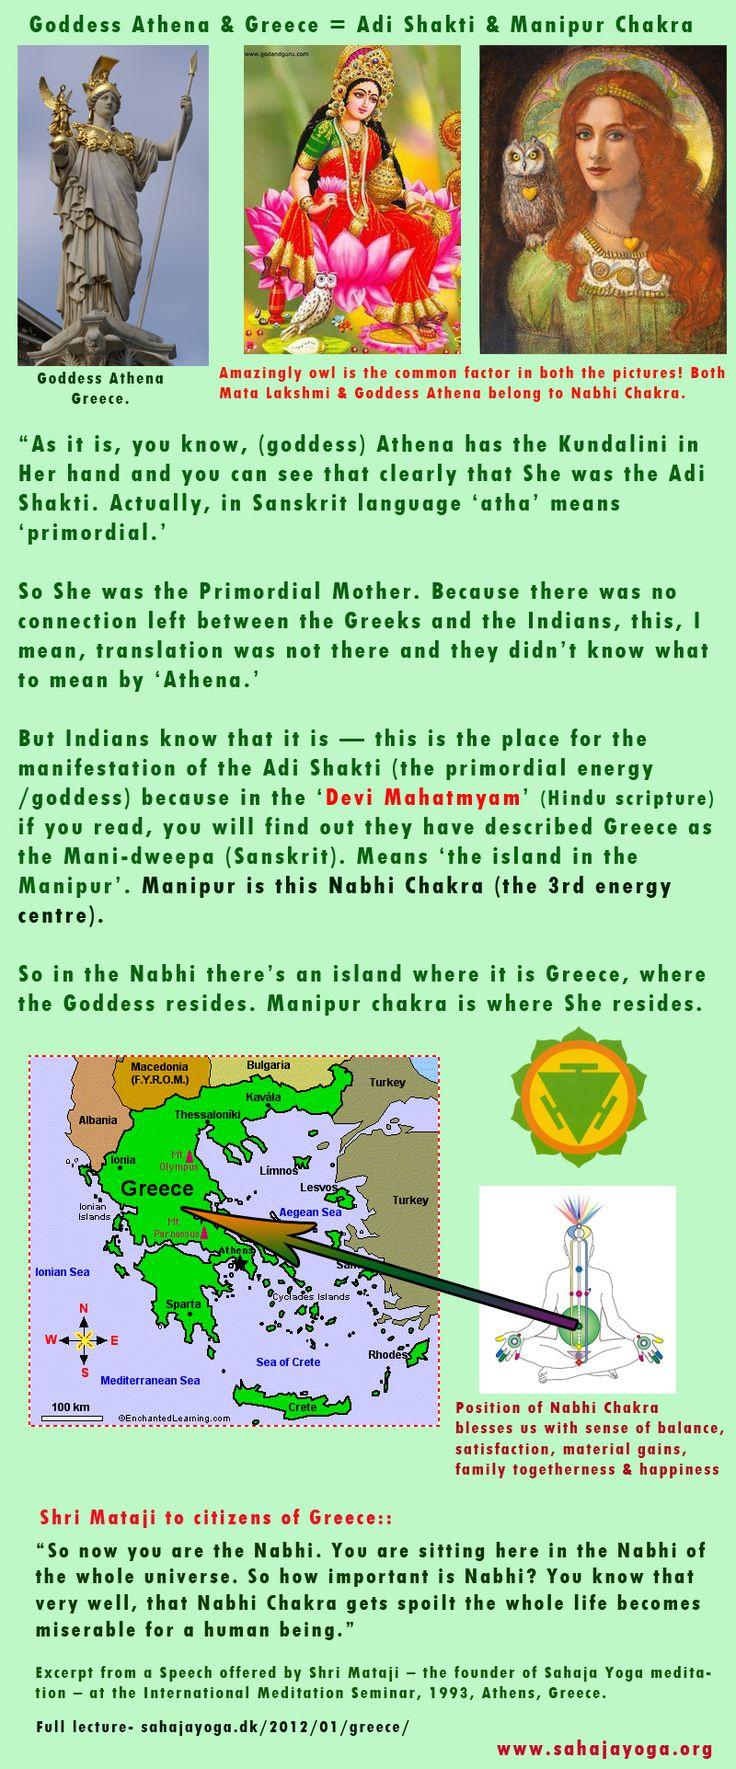 Greece represents the Nabhi Chakra (Manipura Chakra) or the 3rd/ Solar energy center in the world subtle map.